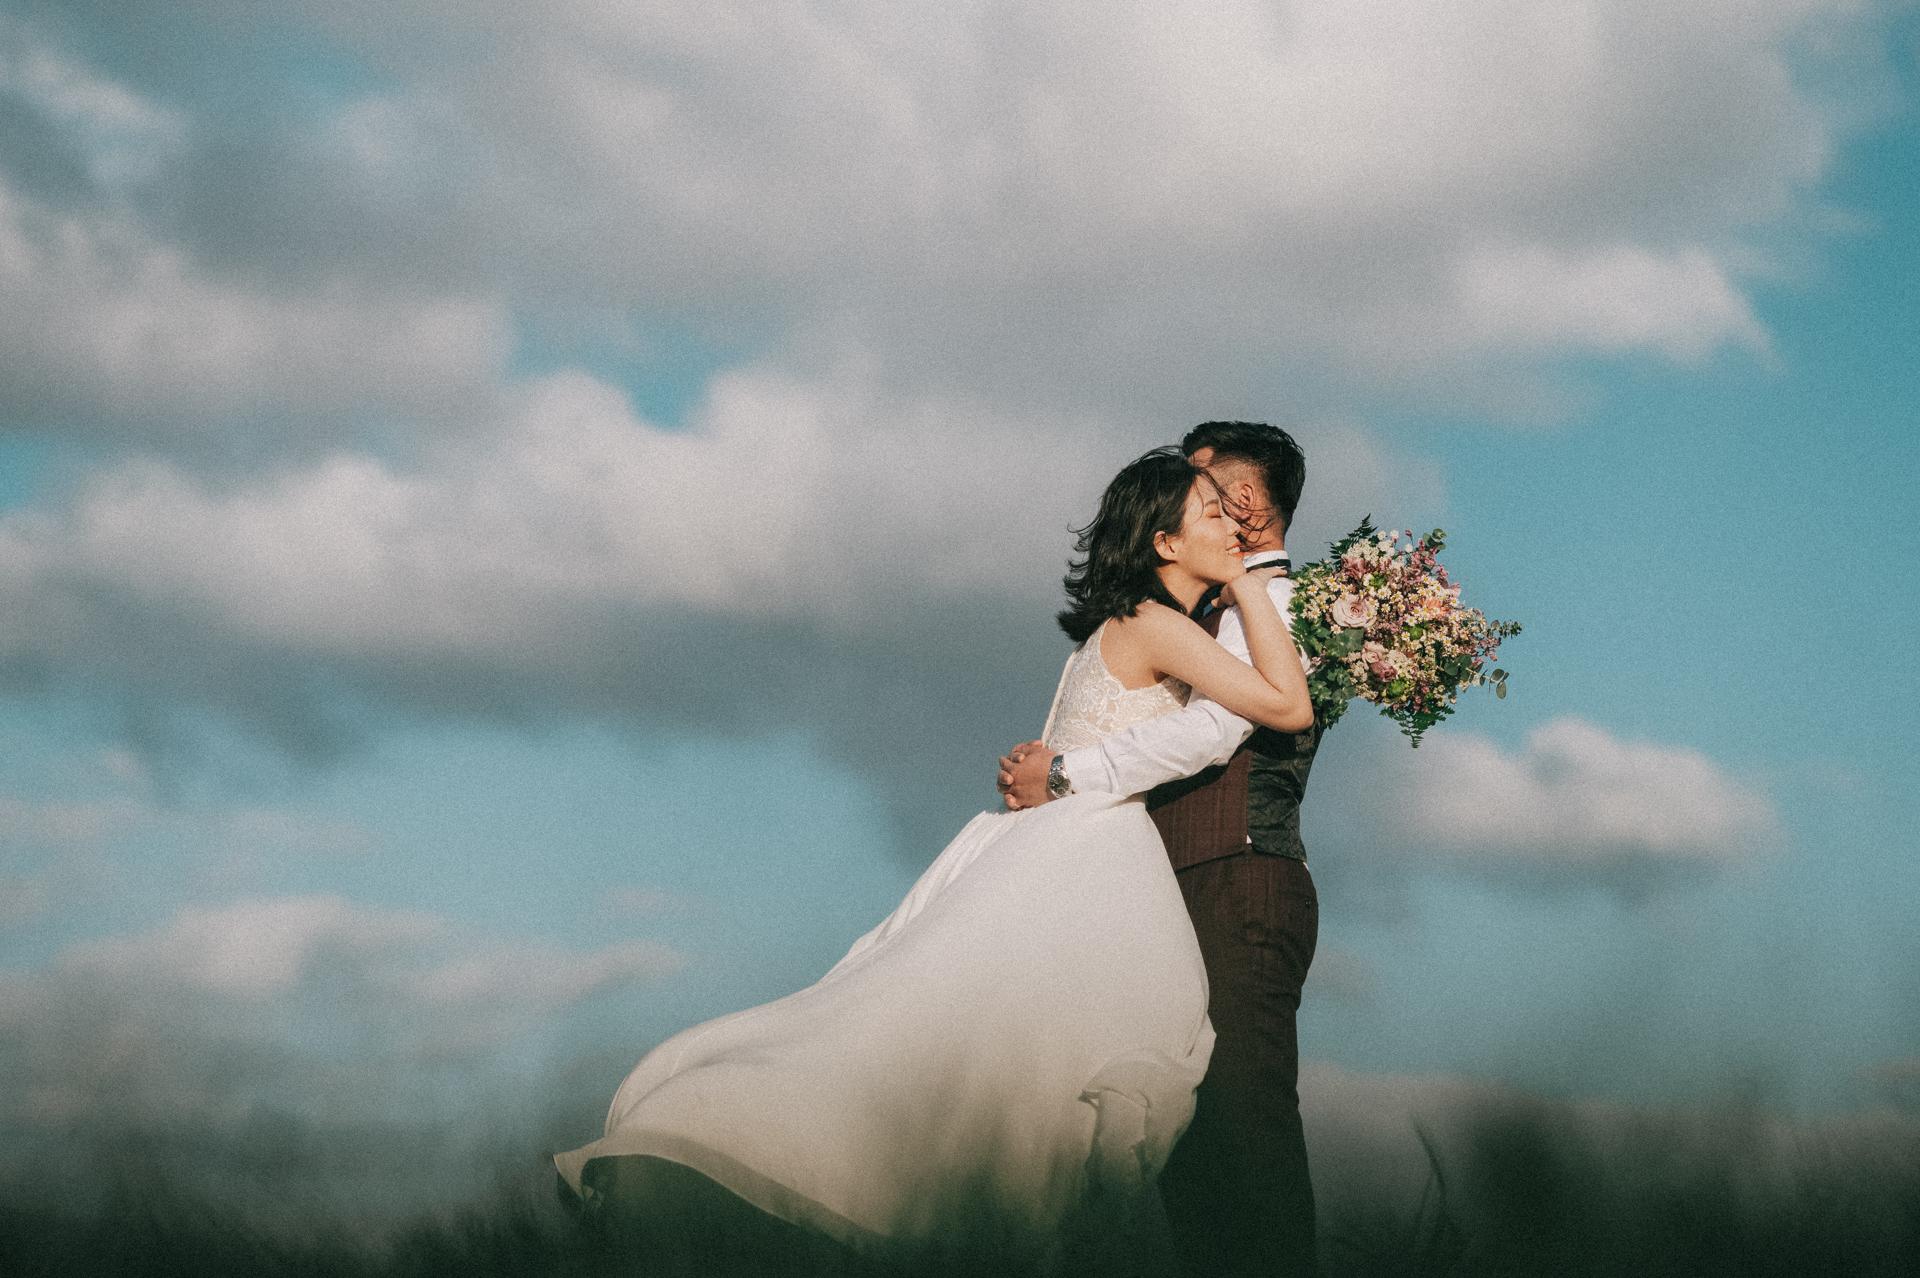 【婚紗】Jaden & Ariel / 華中河濱公園 / EASTERN WEDDING studio